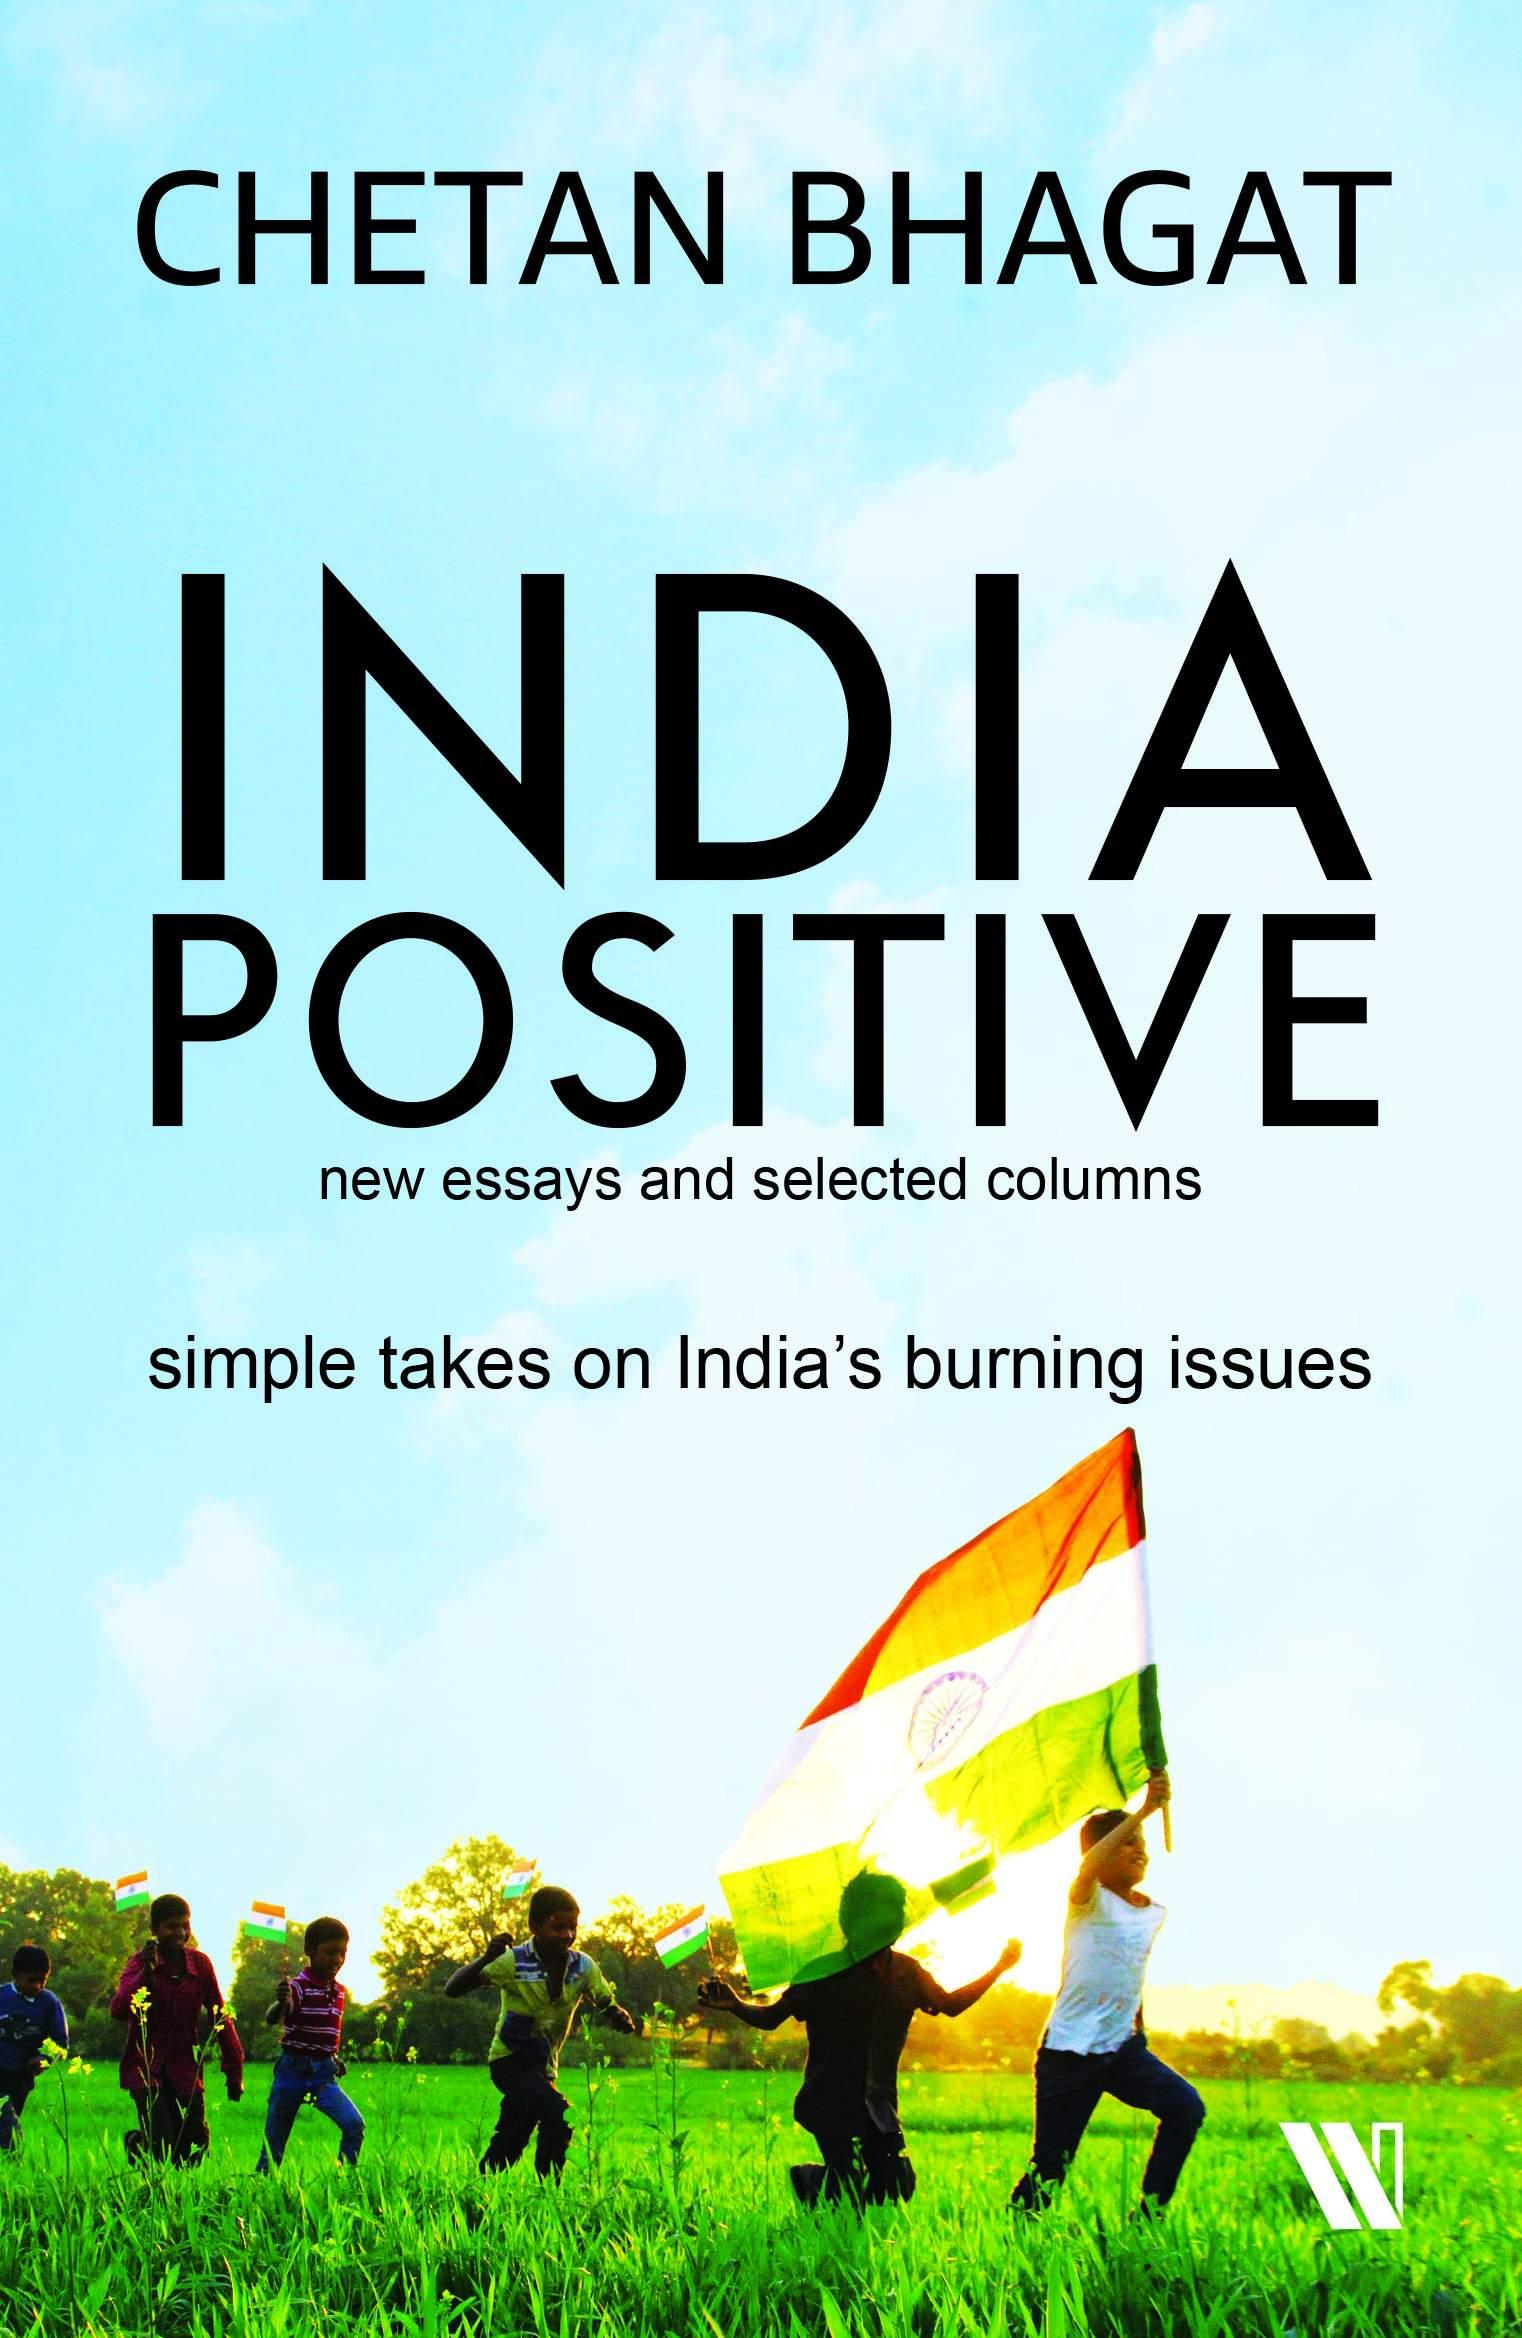 Chetan Bhagat India Positive